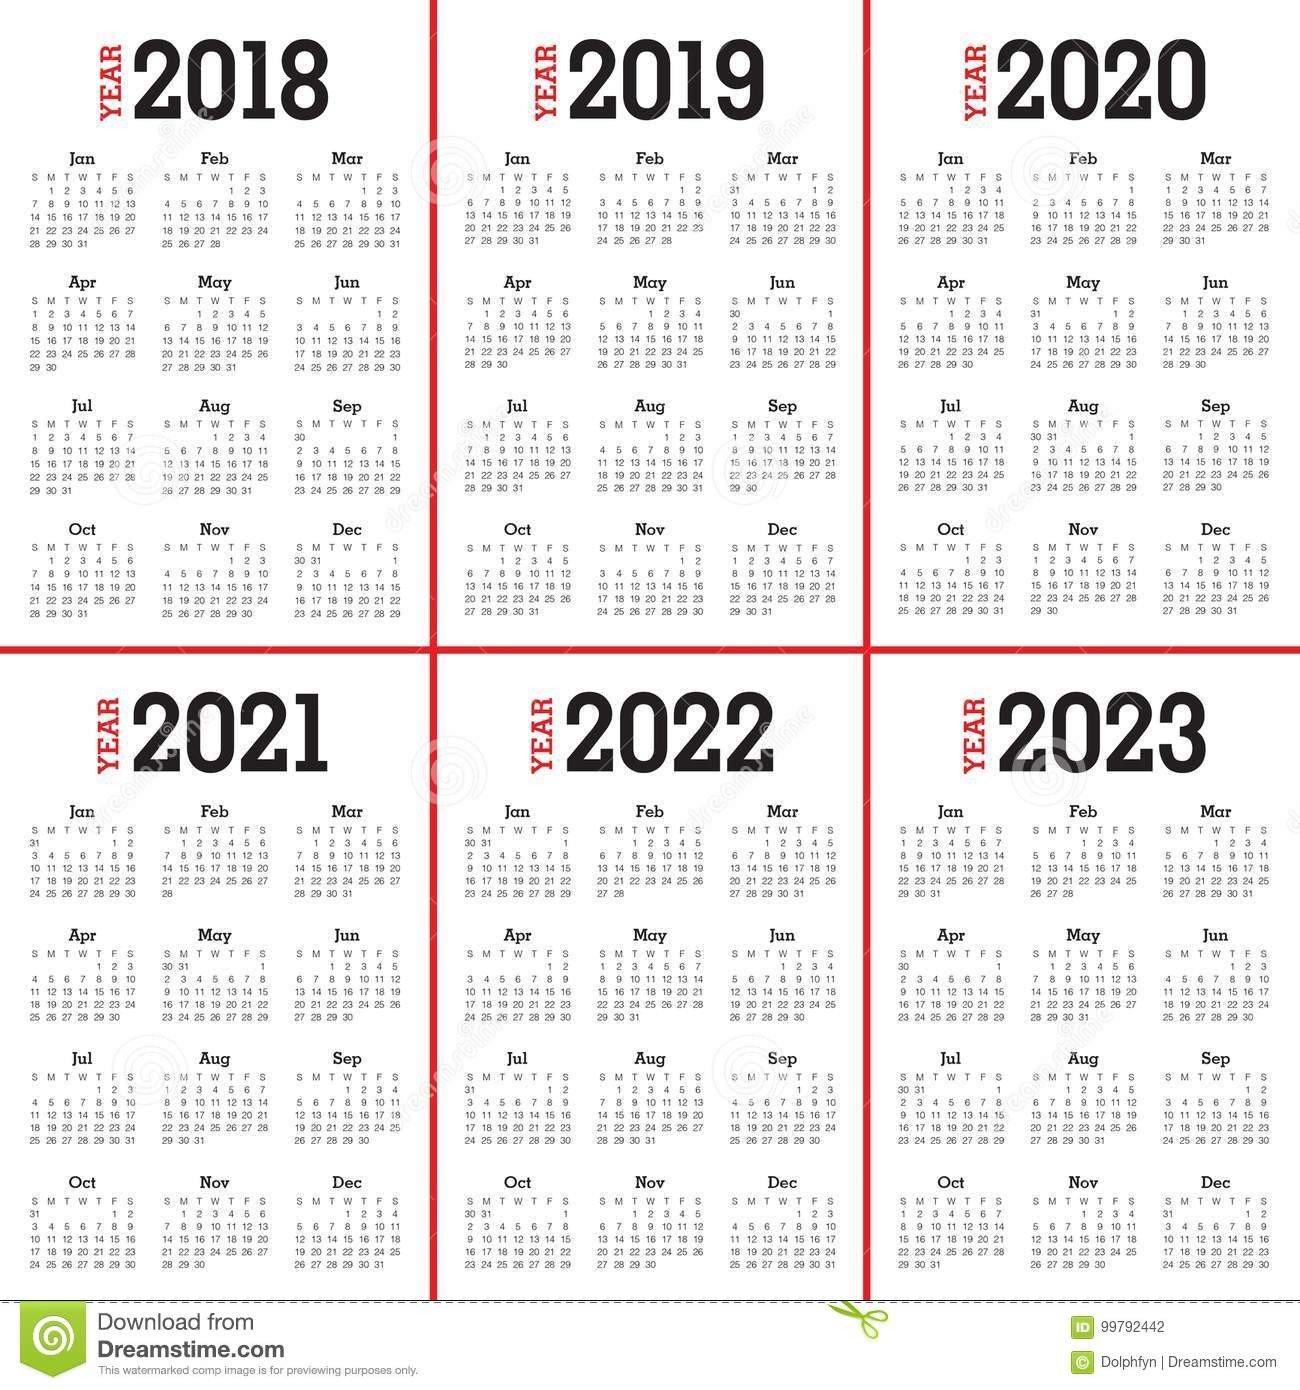 Unique 5 Year Calendar Printable   Free Printable Calendar Monthly 5 Year Calendar 2019 To 2023 Printable